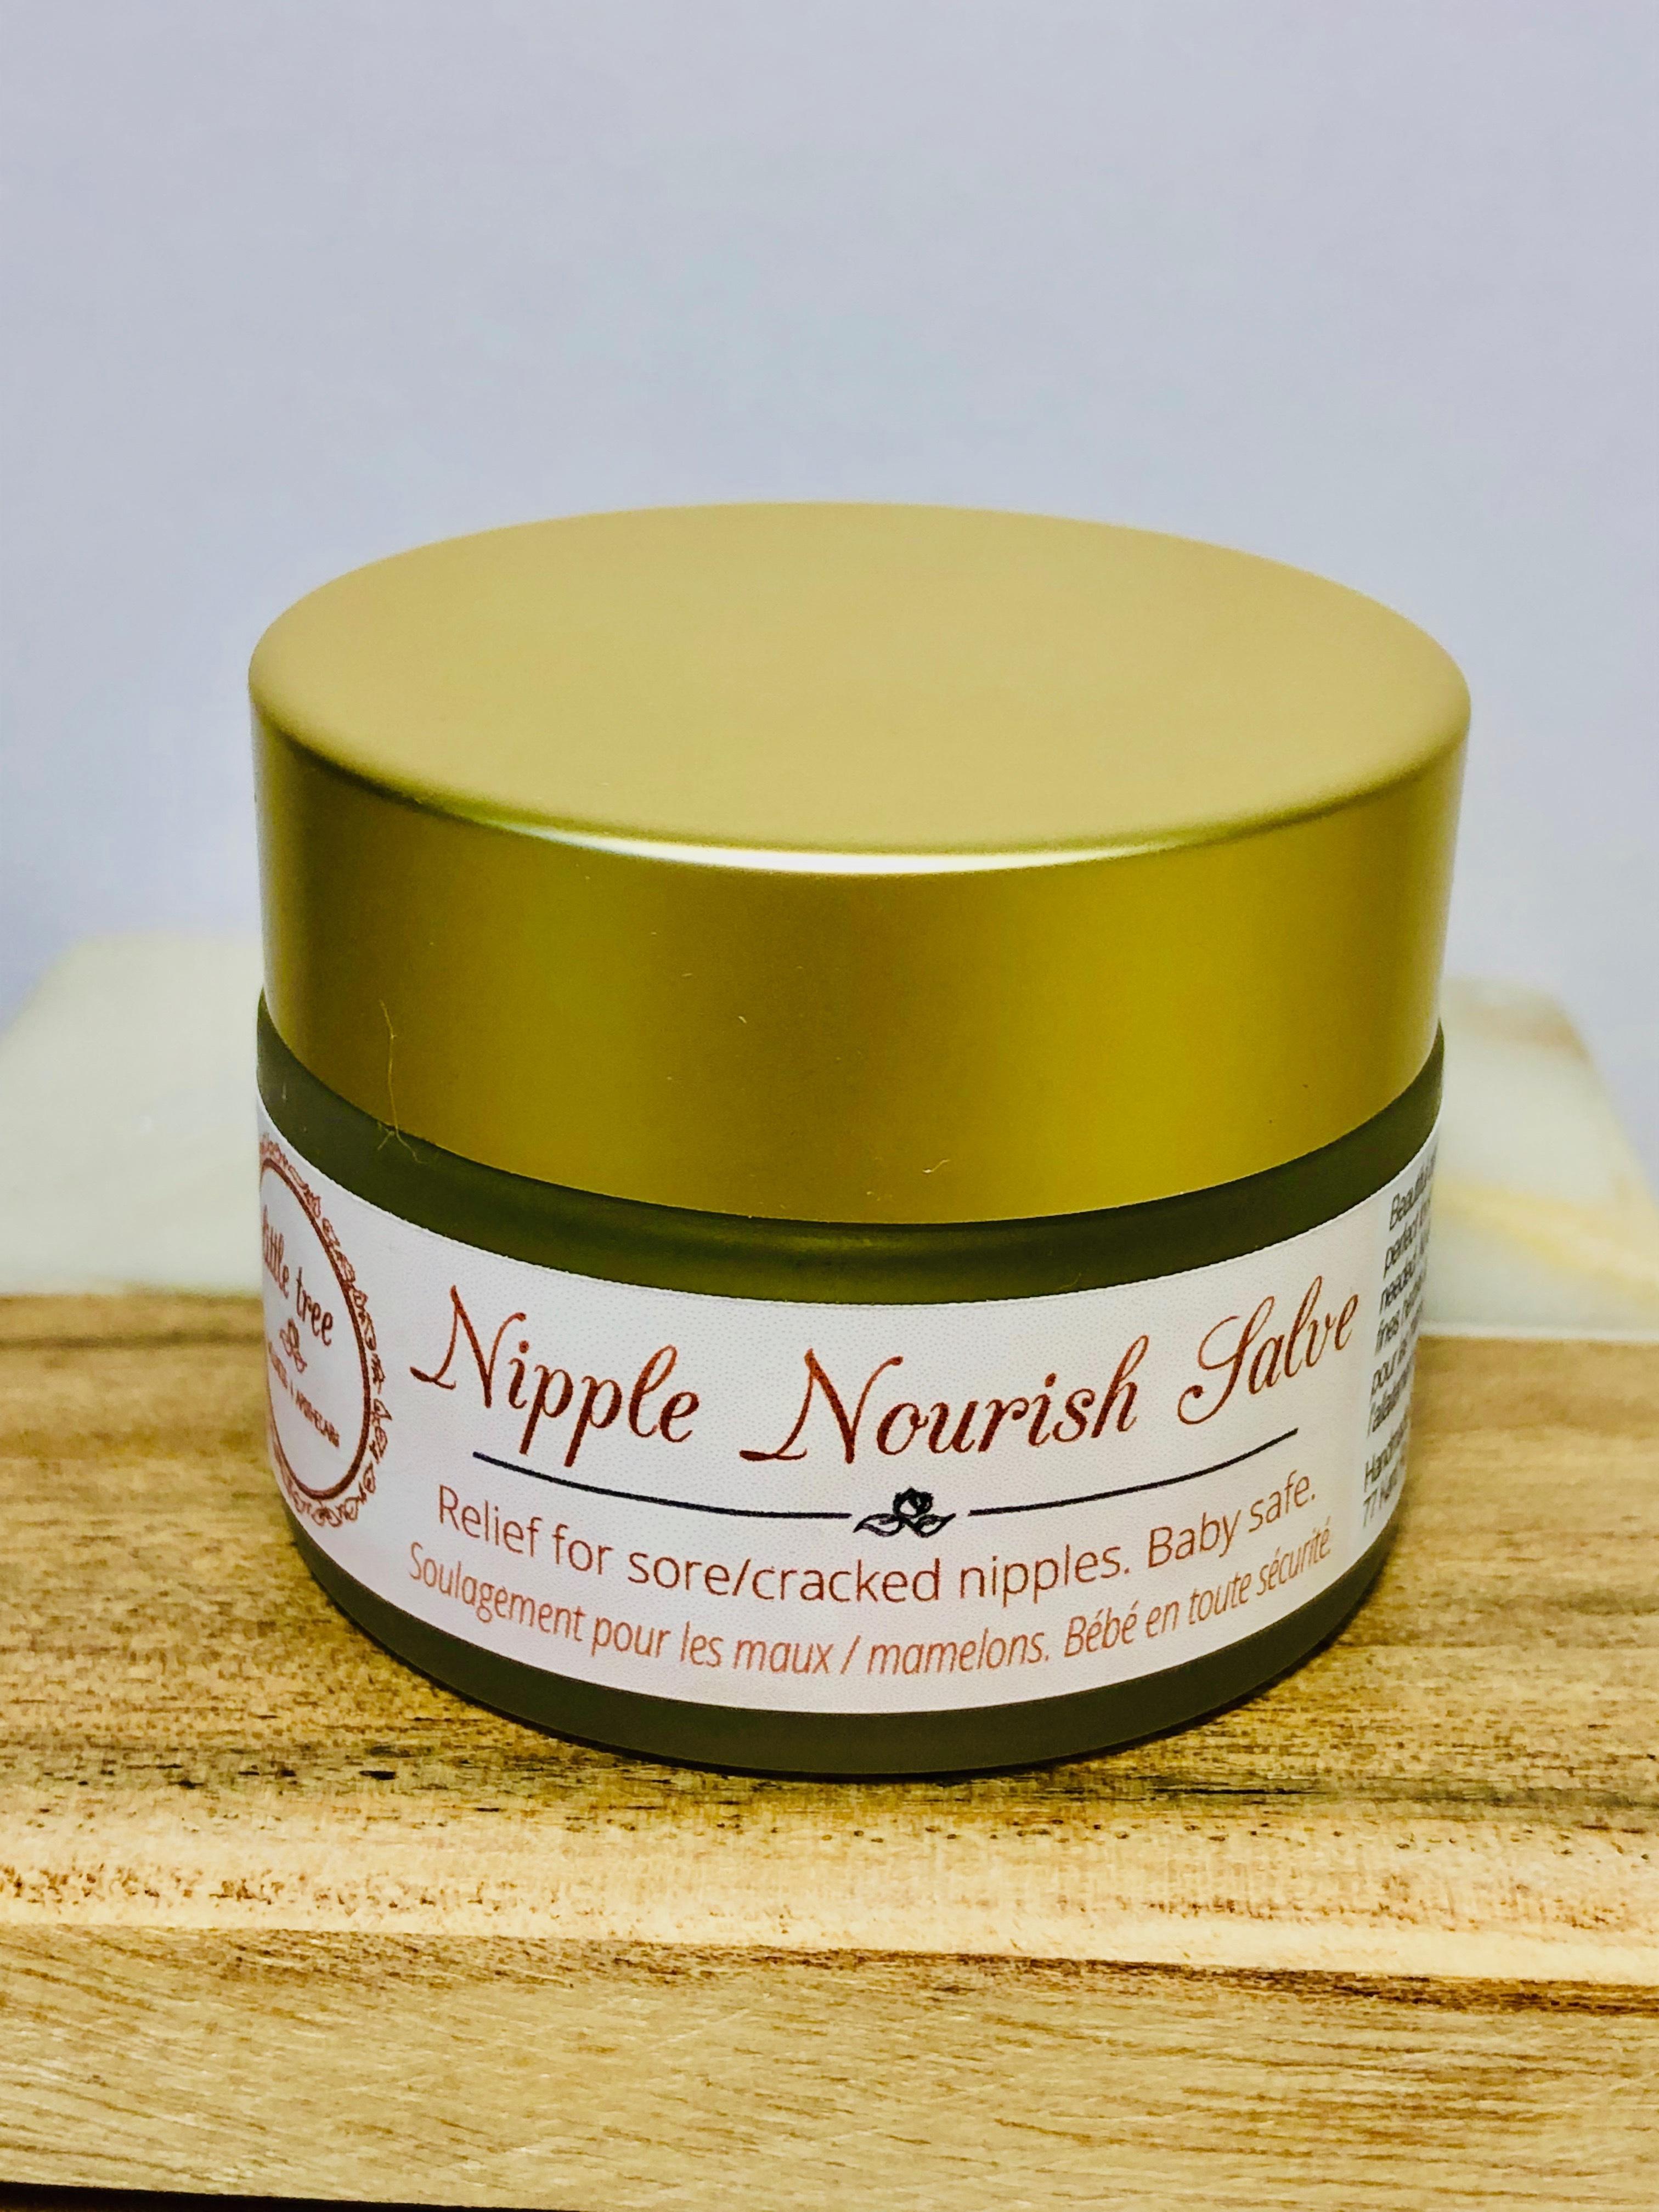 Nipple Nourish Salve (25 g) 00010